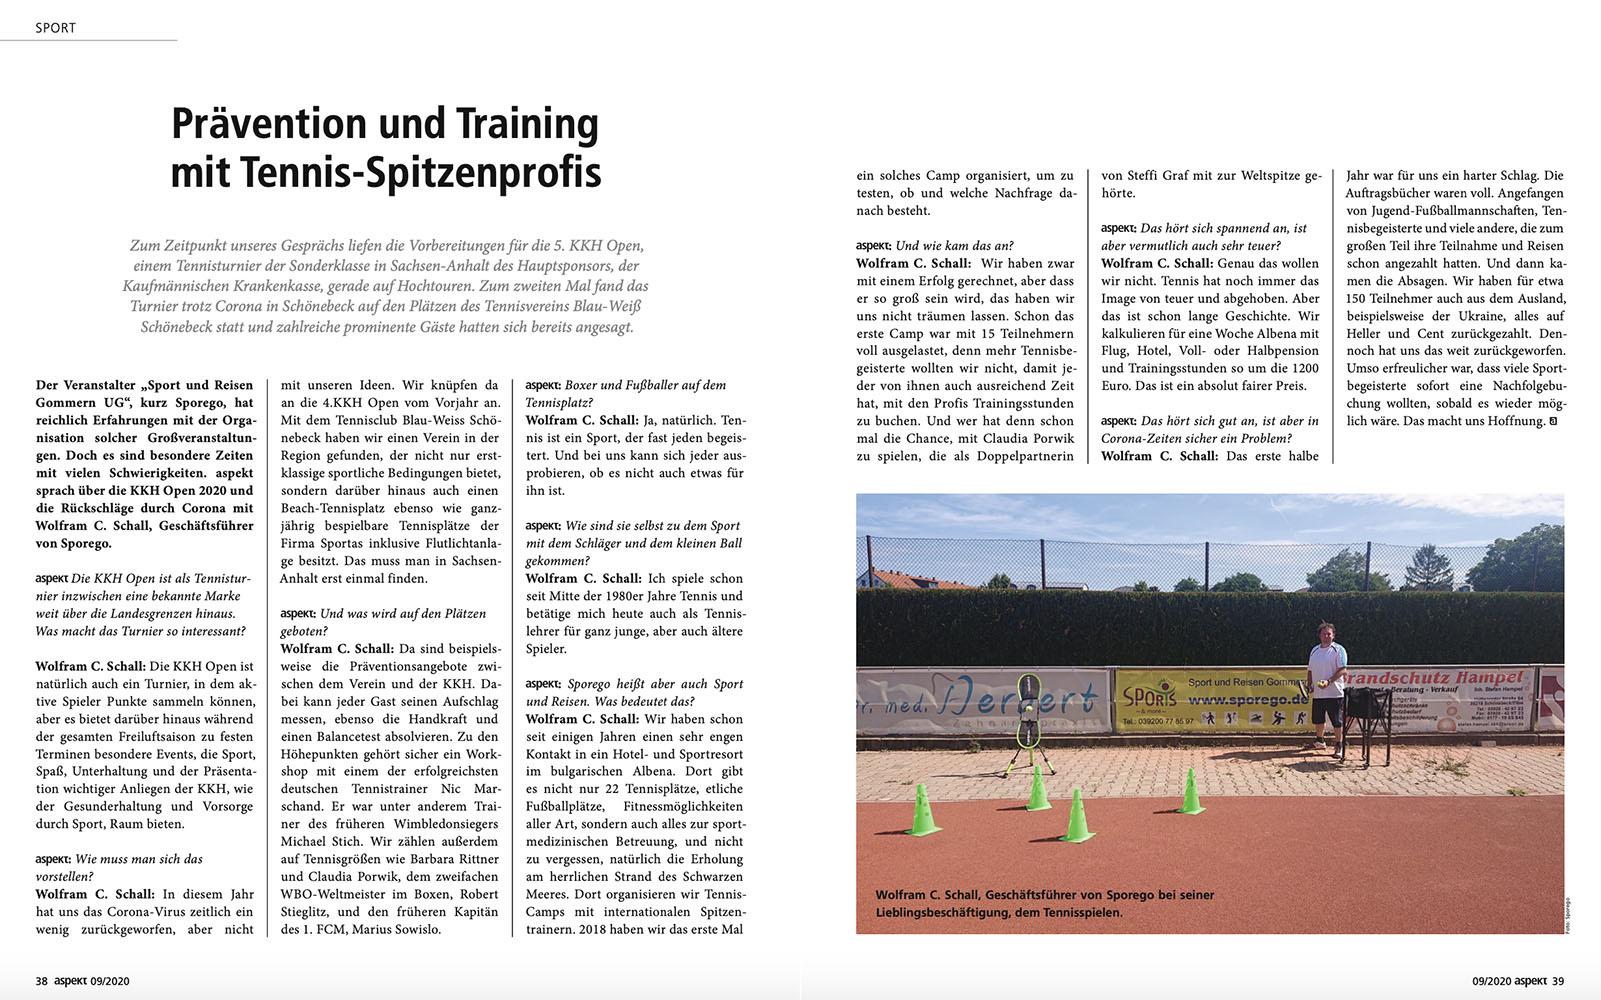 Bericht im Aspekta-Magazin vom September 2020